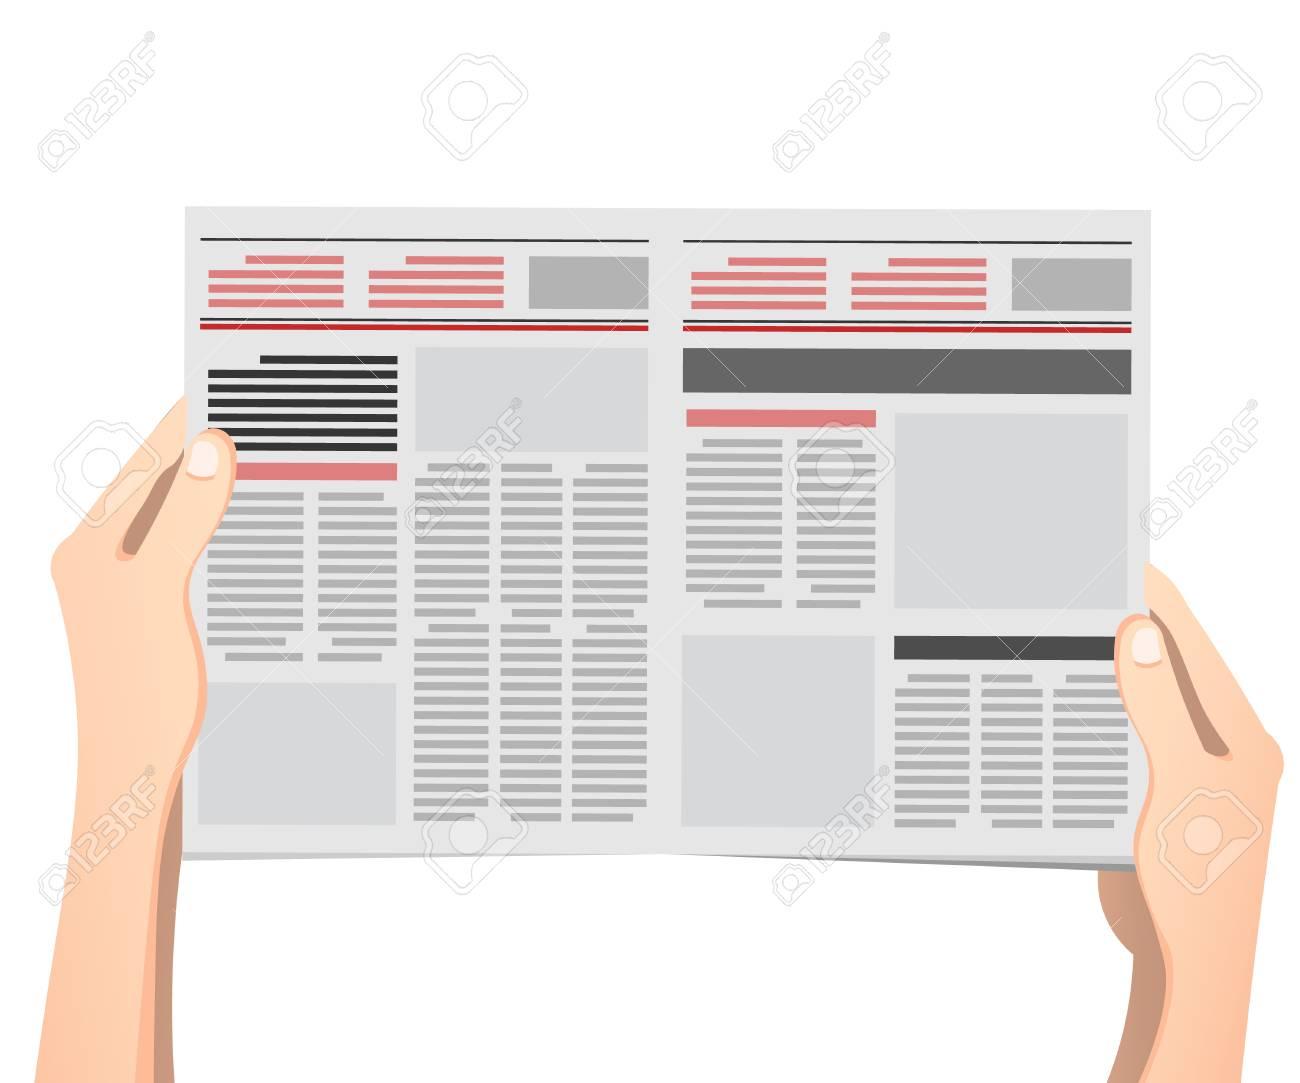 Business man hands holding newspaper vector illustration in flat design. - 92942638